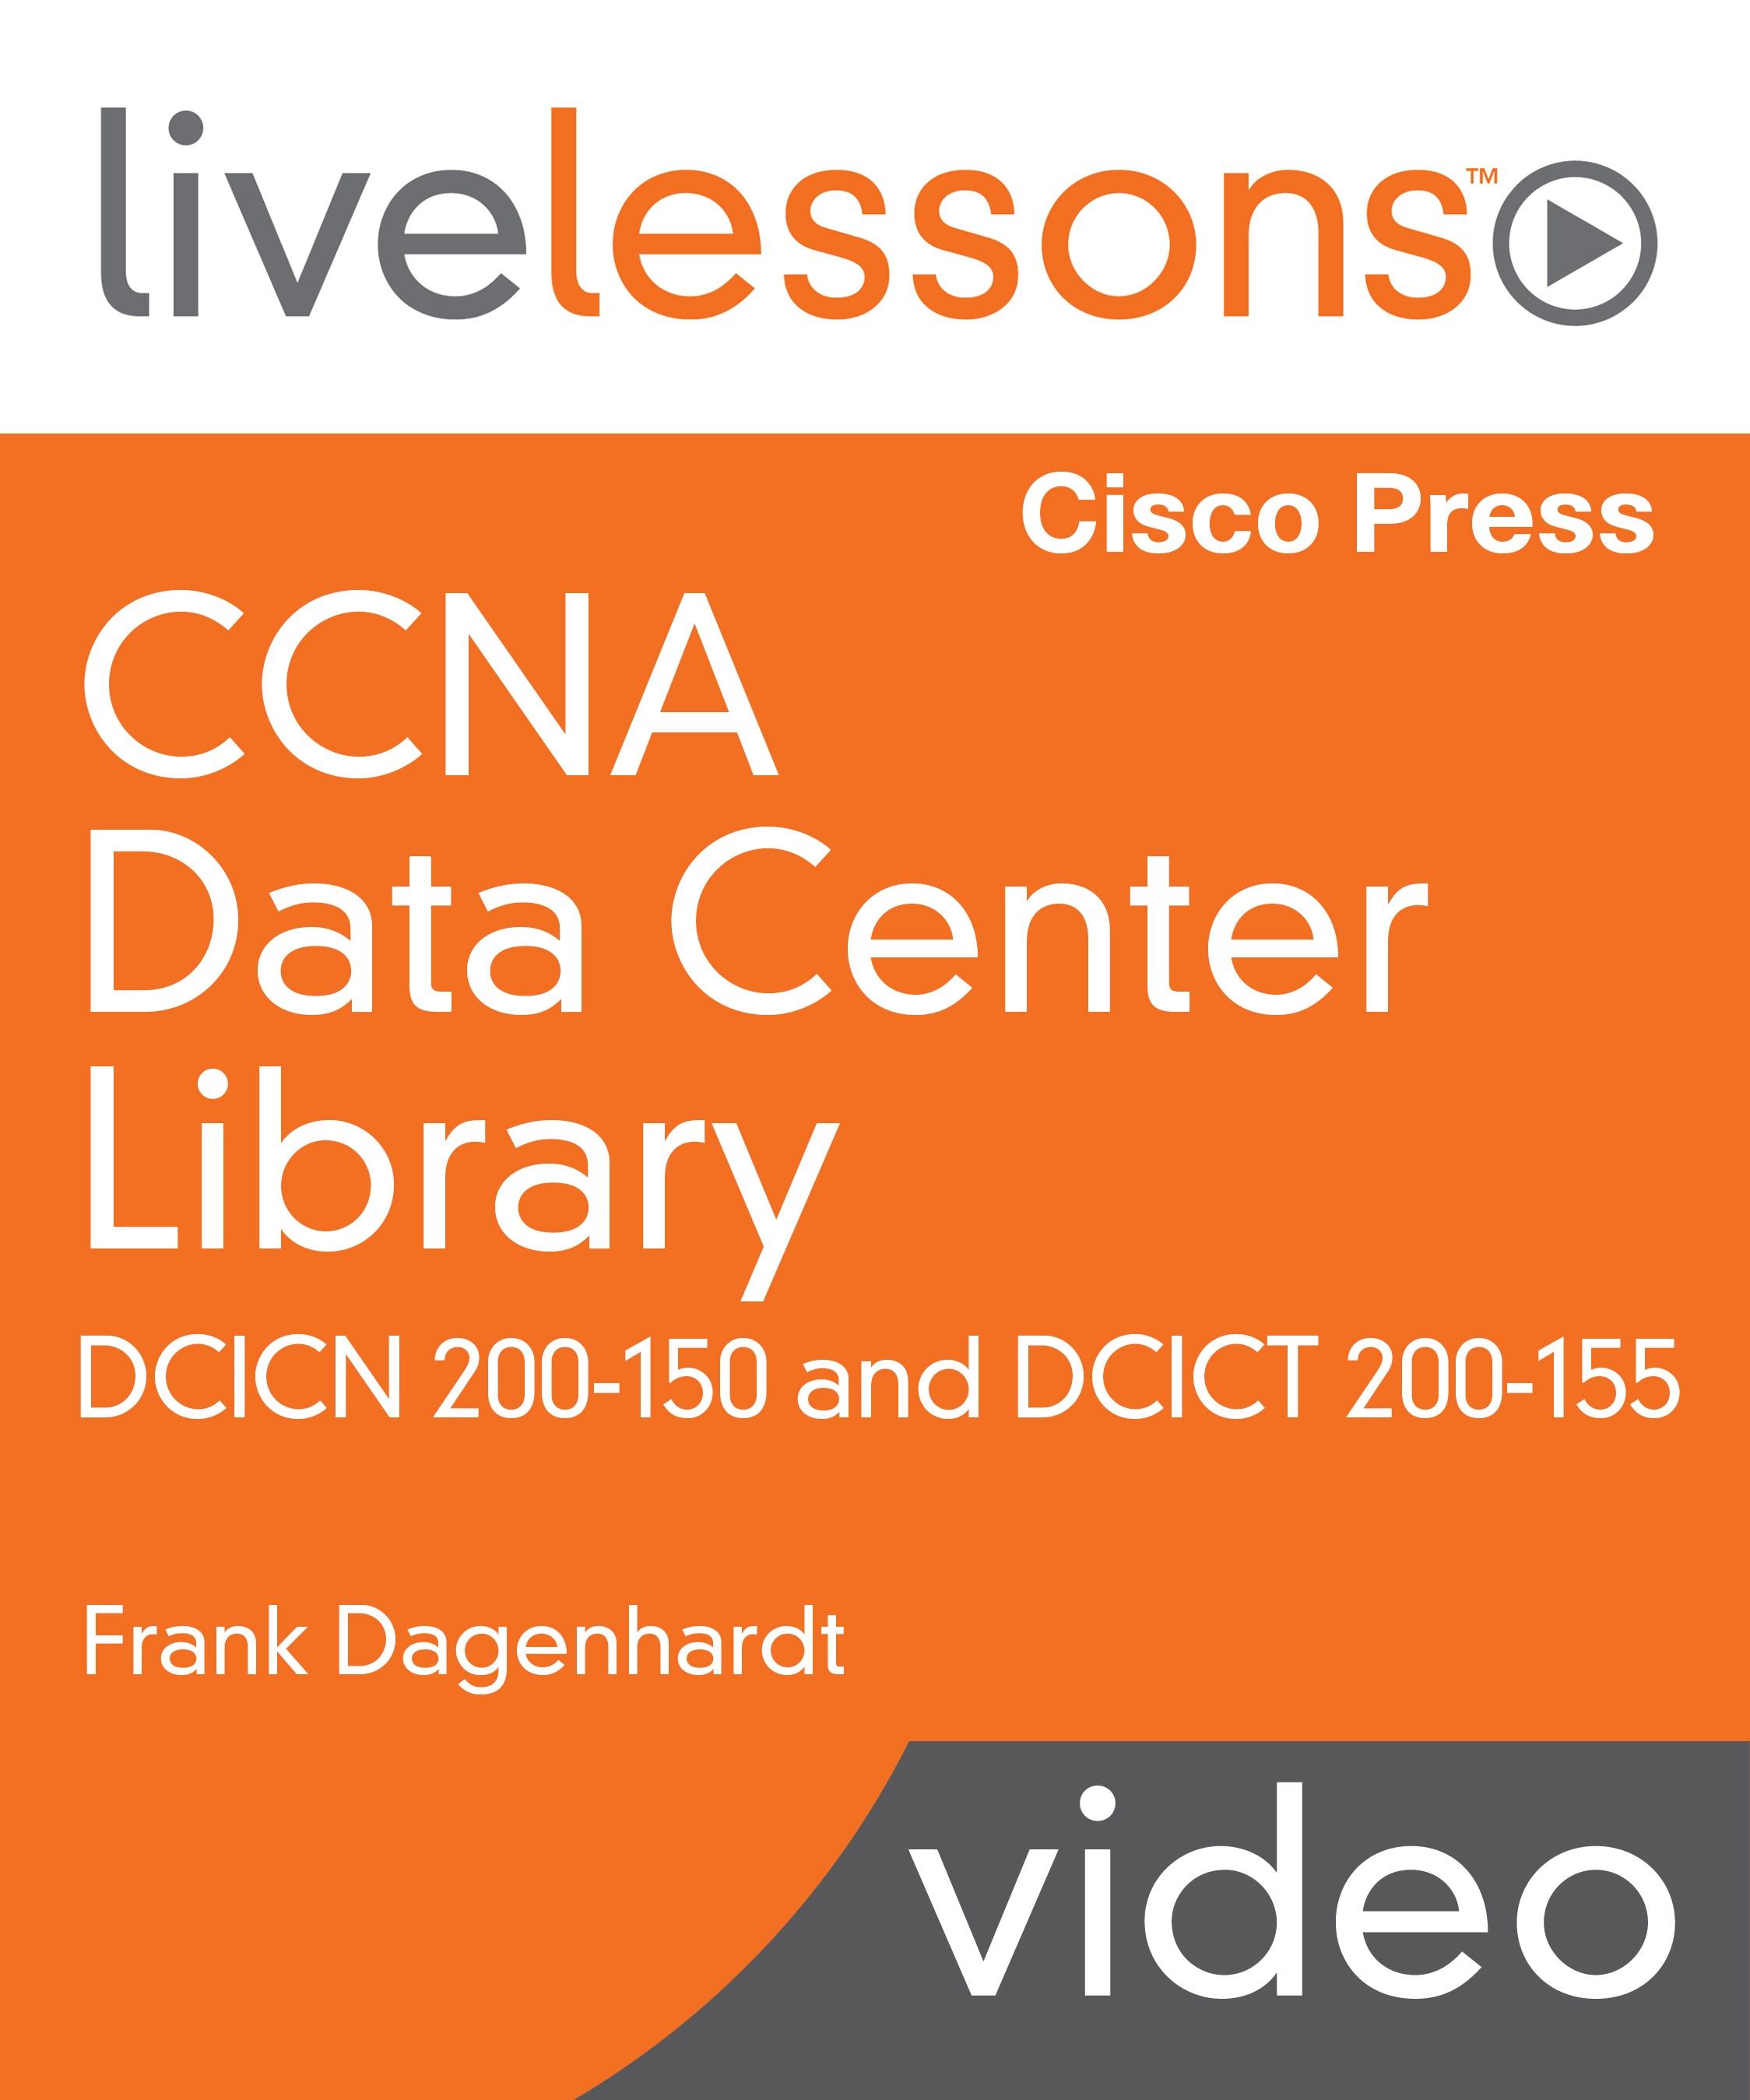 CCNA Data Center LiveLesson Library: DCICN 200-150 and DCICT 200-155